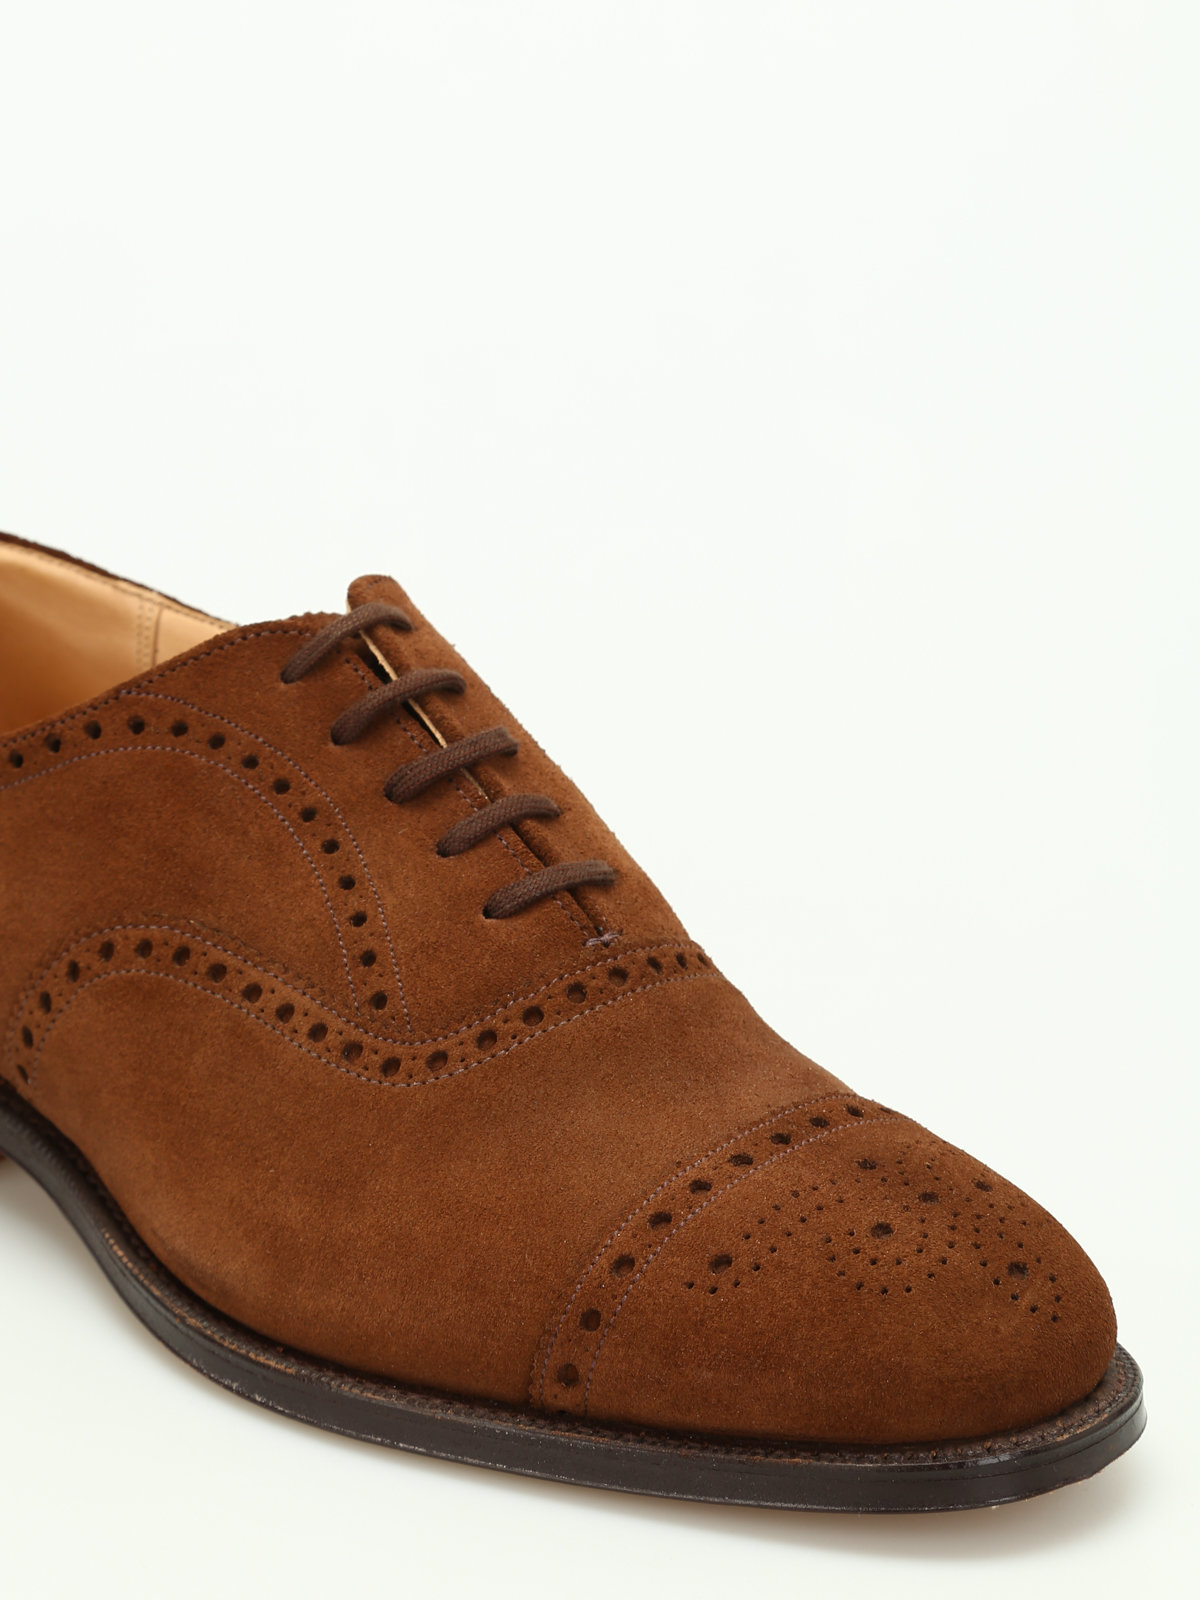 Diplomat superbuck suede shoes